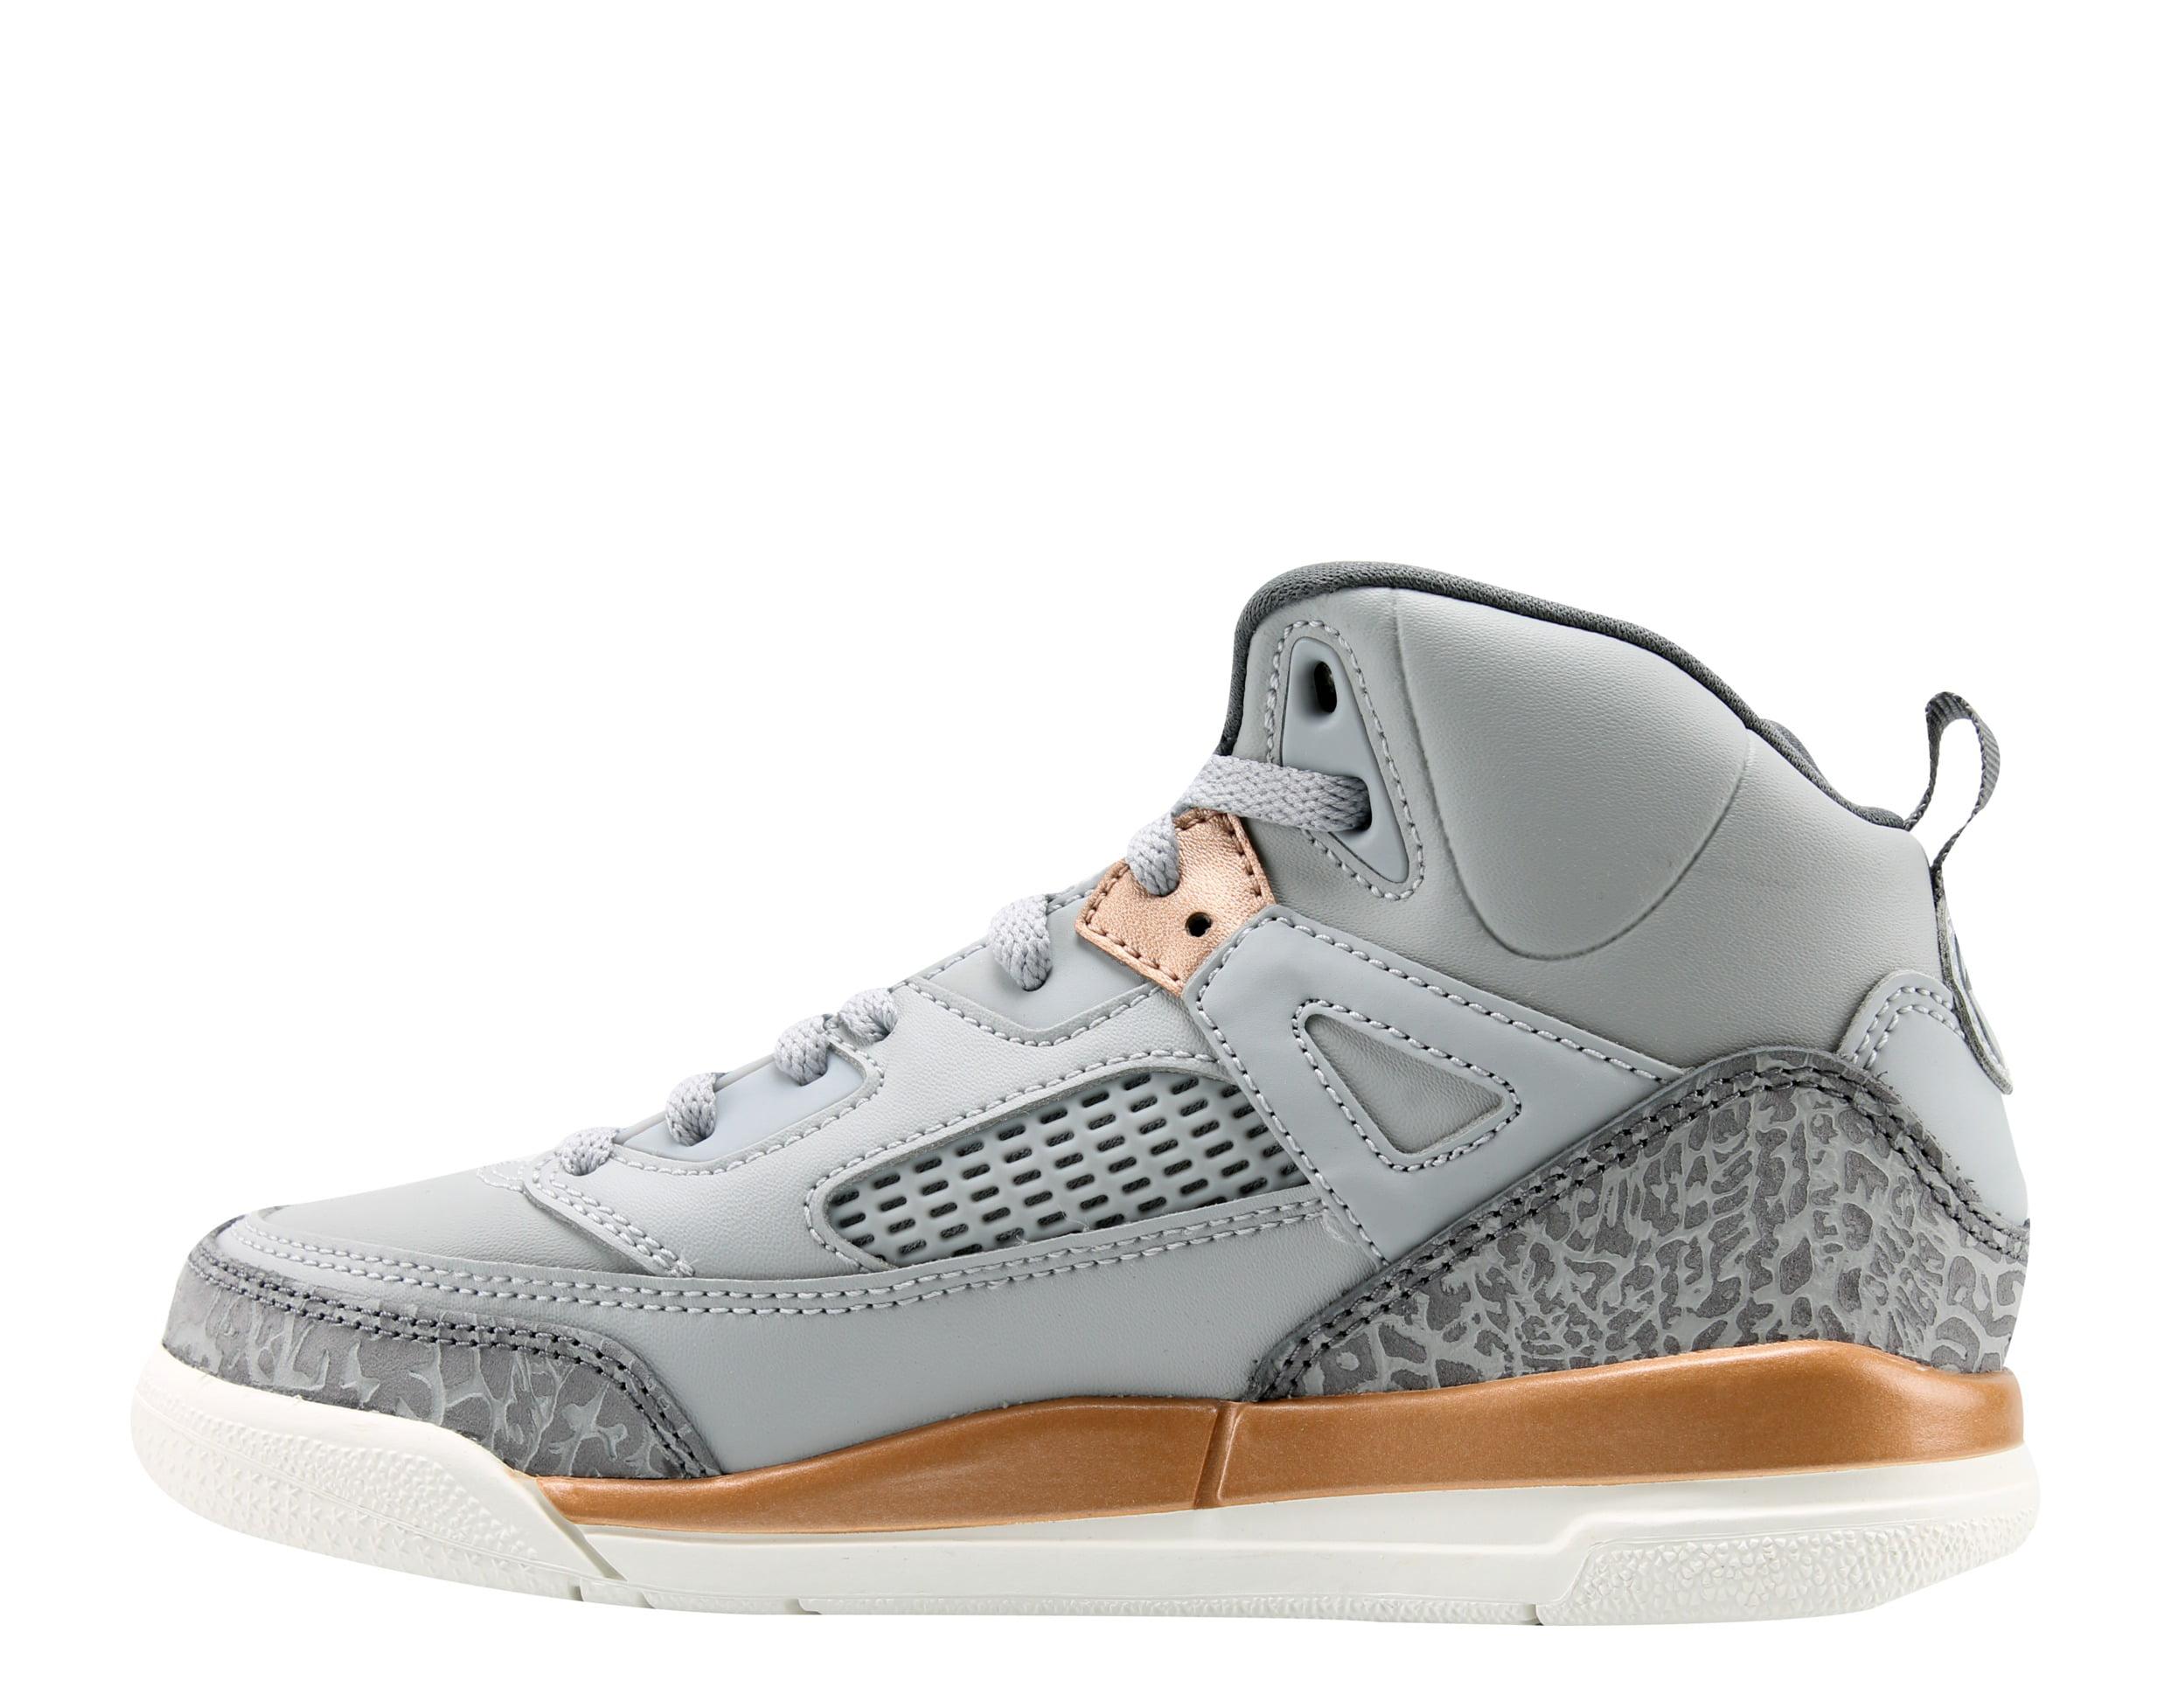 Nike Air Jordan Spizike GP Grey/Bronze Little Girls Basketball Shoes 535708-018